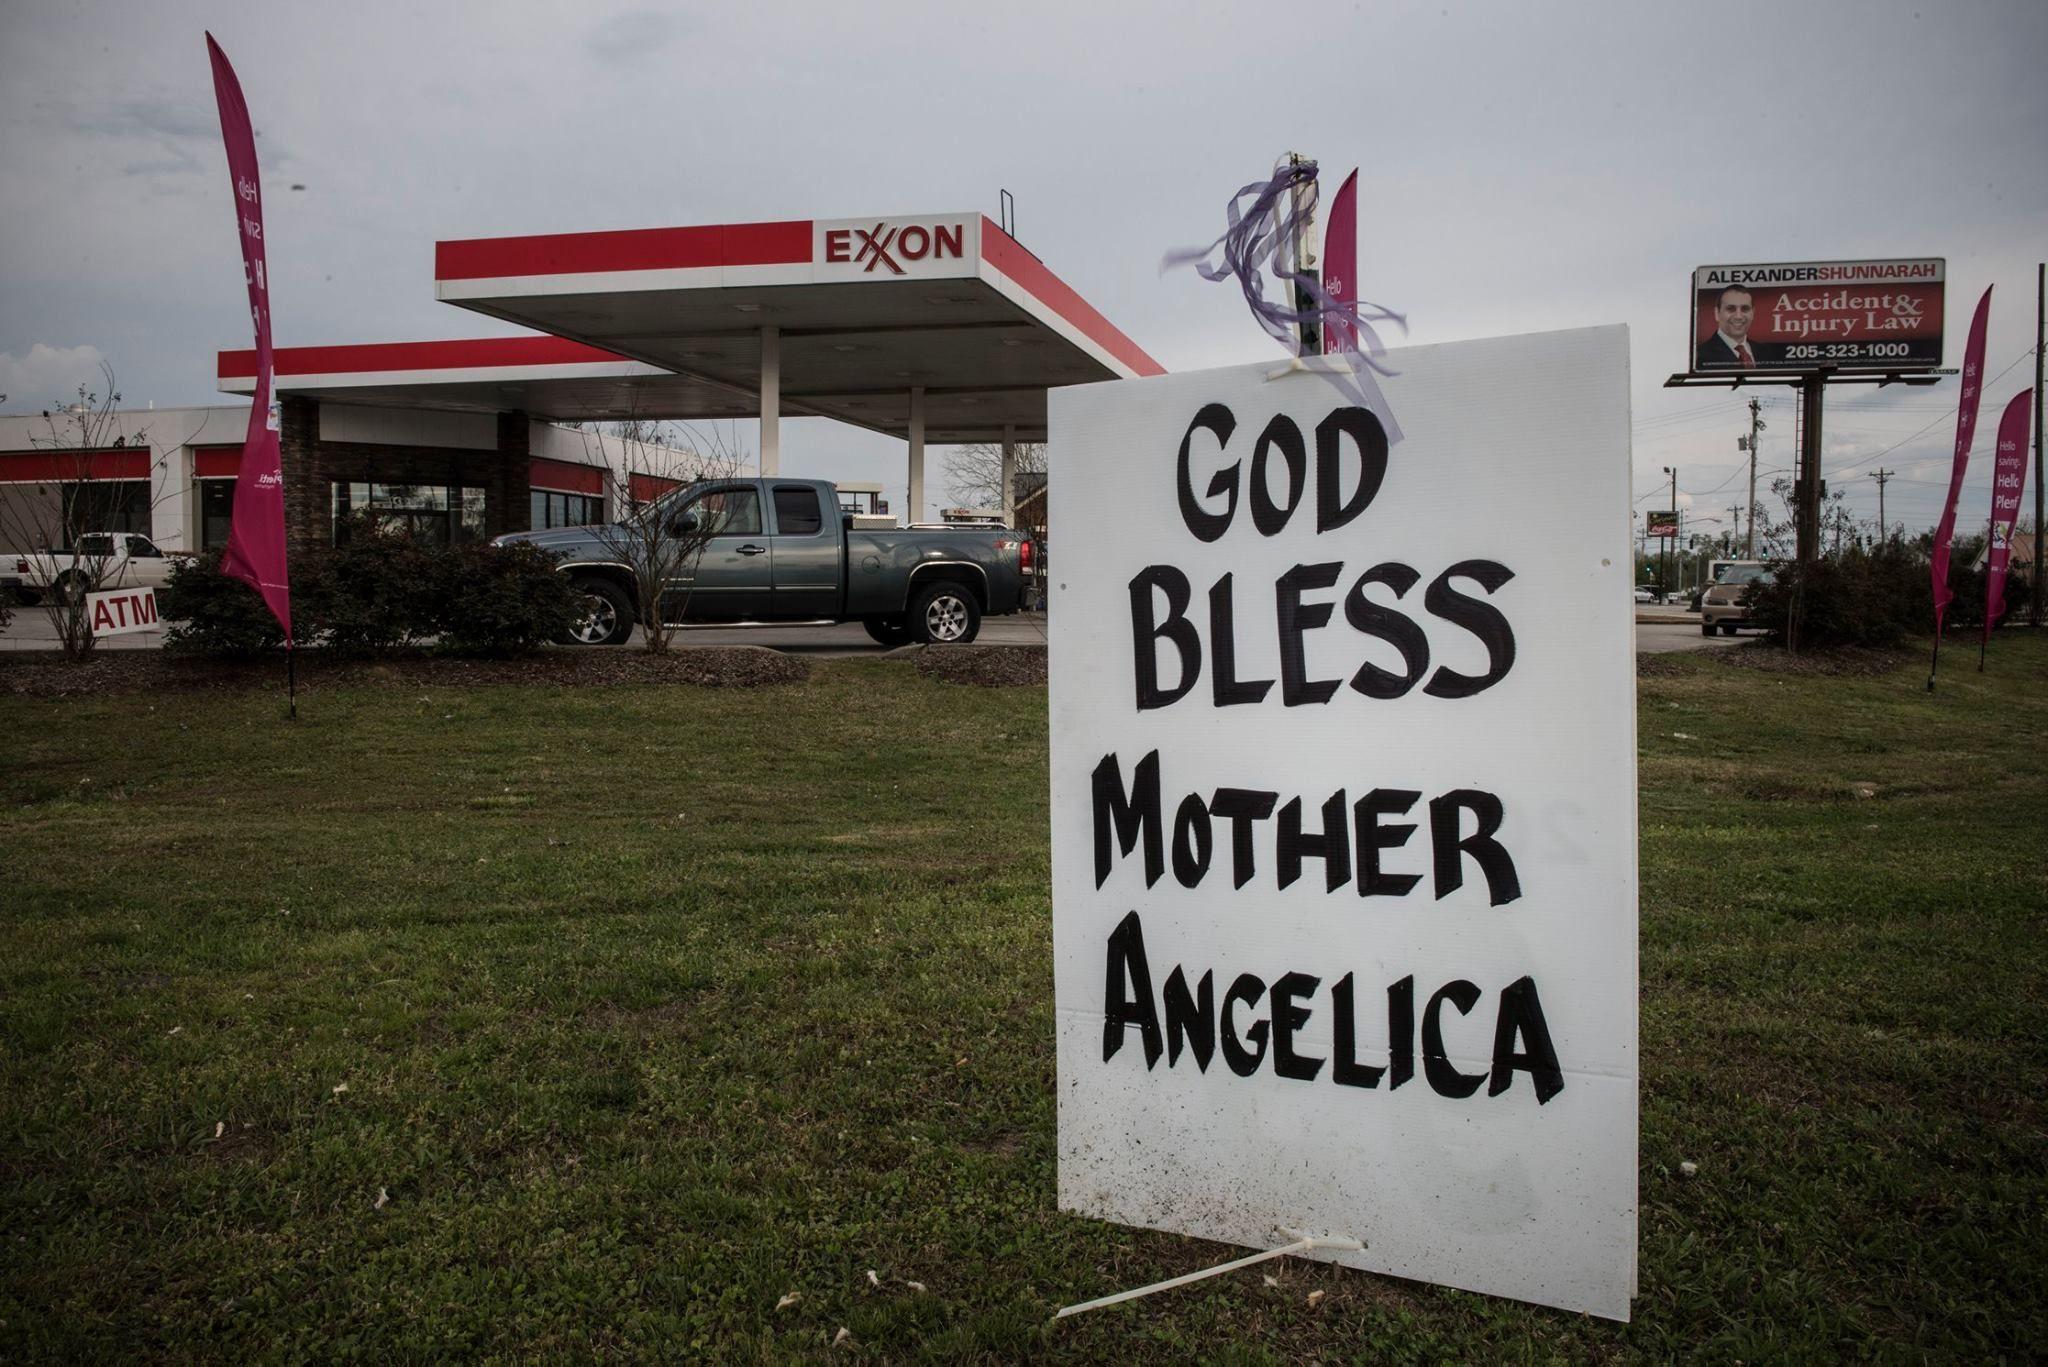 Mother angelica mother angelica blessed mother angelica